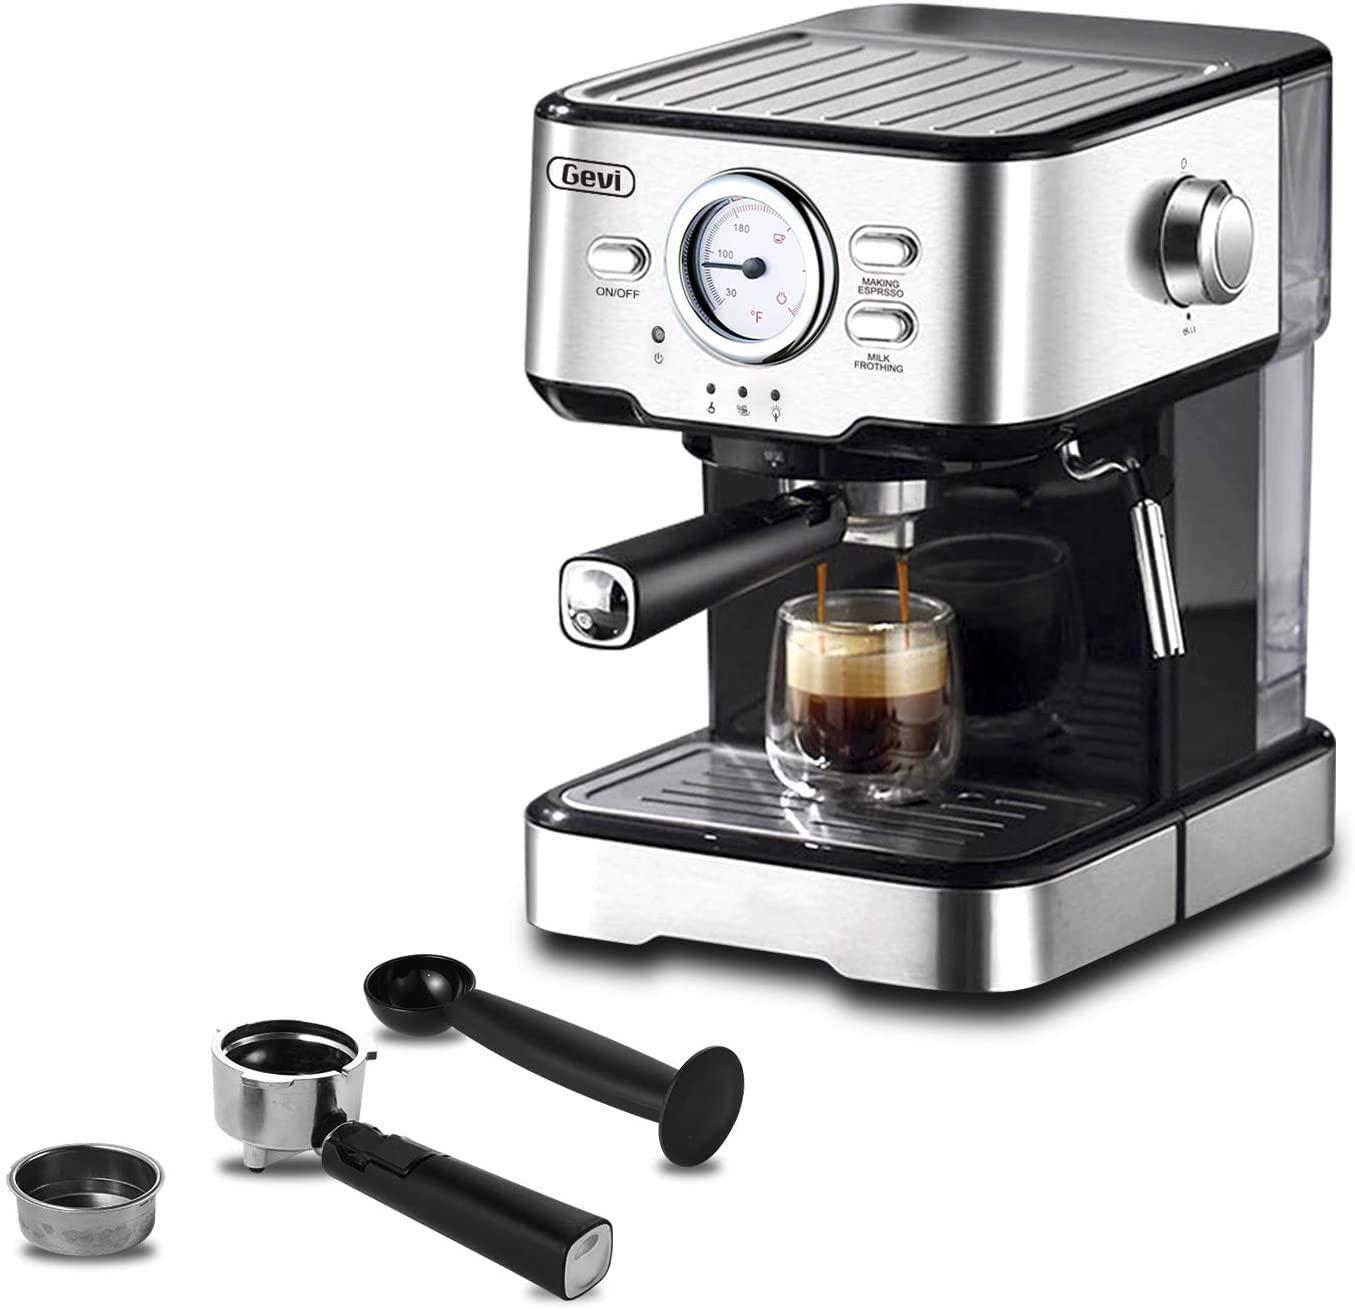 Gevi Espresso Machine | Coffee Brew Mag